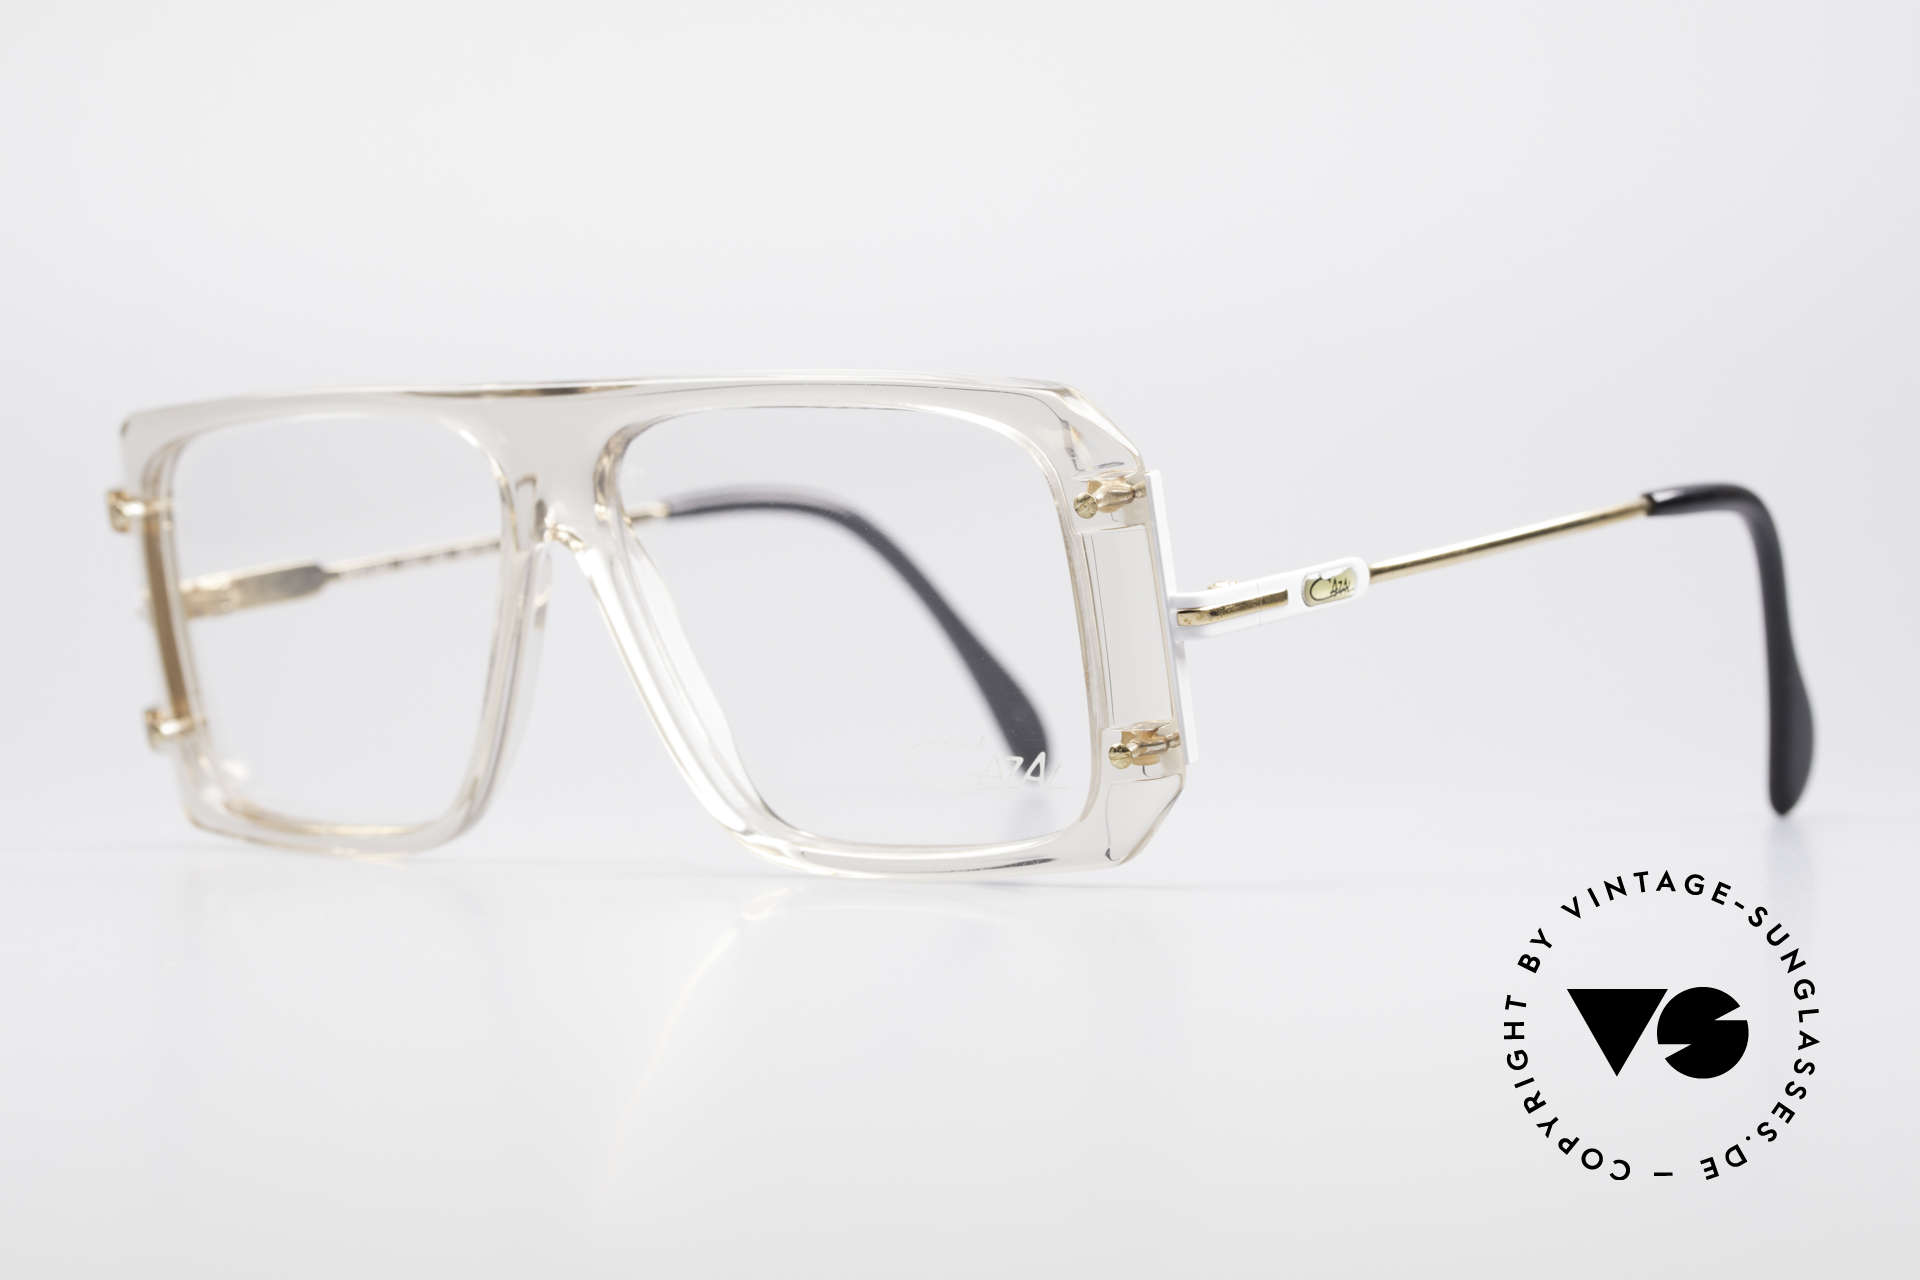 Cazal 633 Vintage Celebrity Eyeglasses, authentic Hip-Hop style of the 1980's (true vintage!), Made for Men